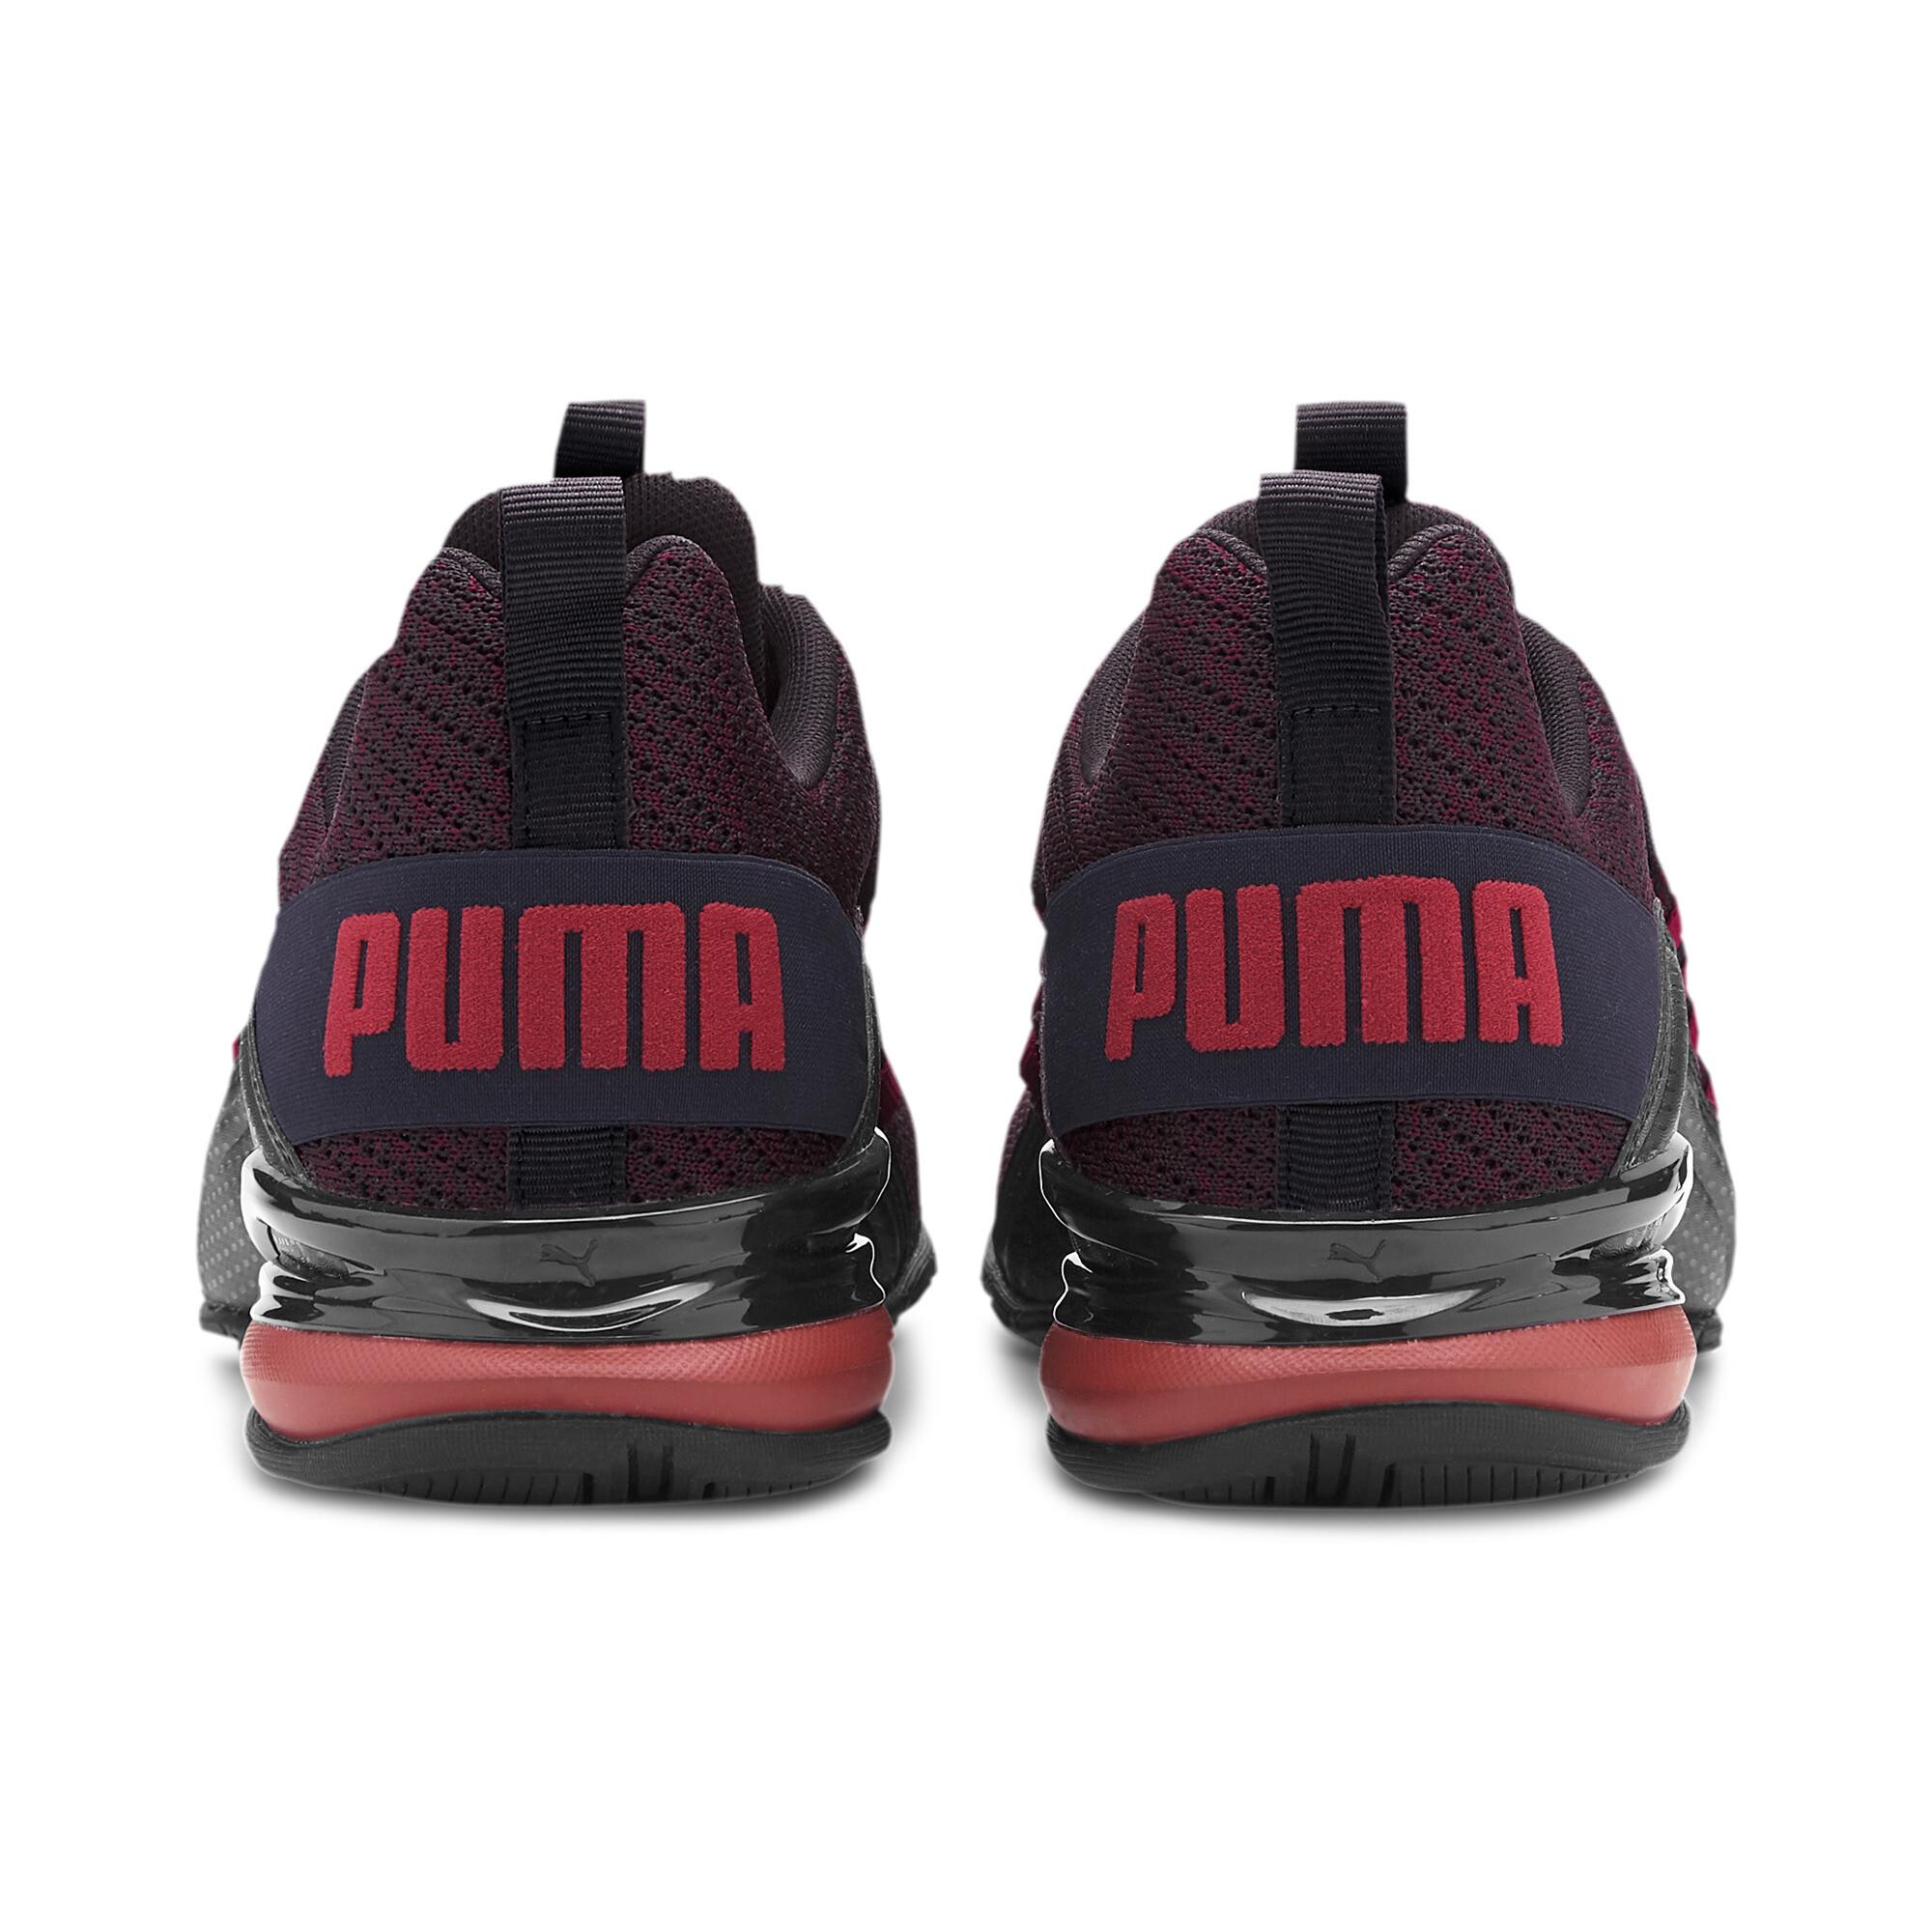 PUMA-Men-039-s-Axelion-Ultra-Running-Shoes thumbnail 10